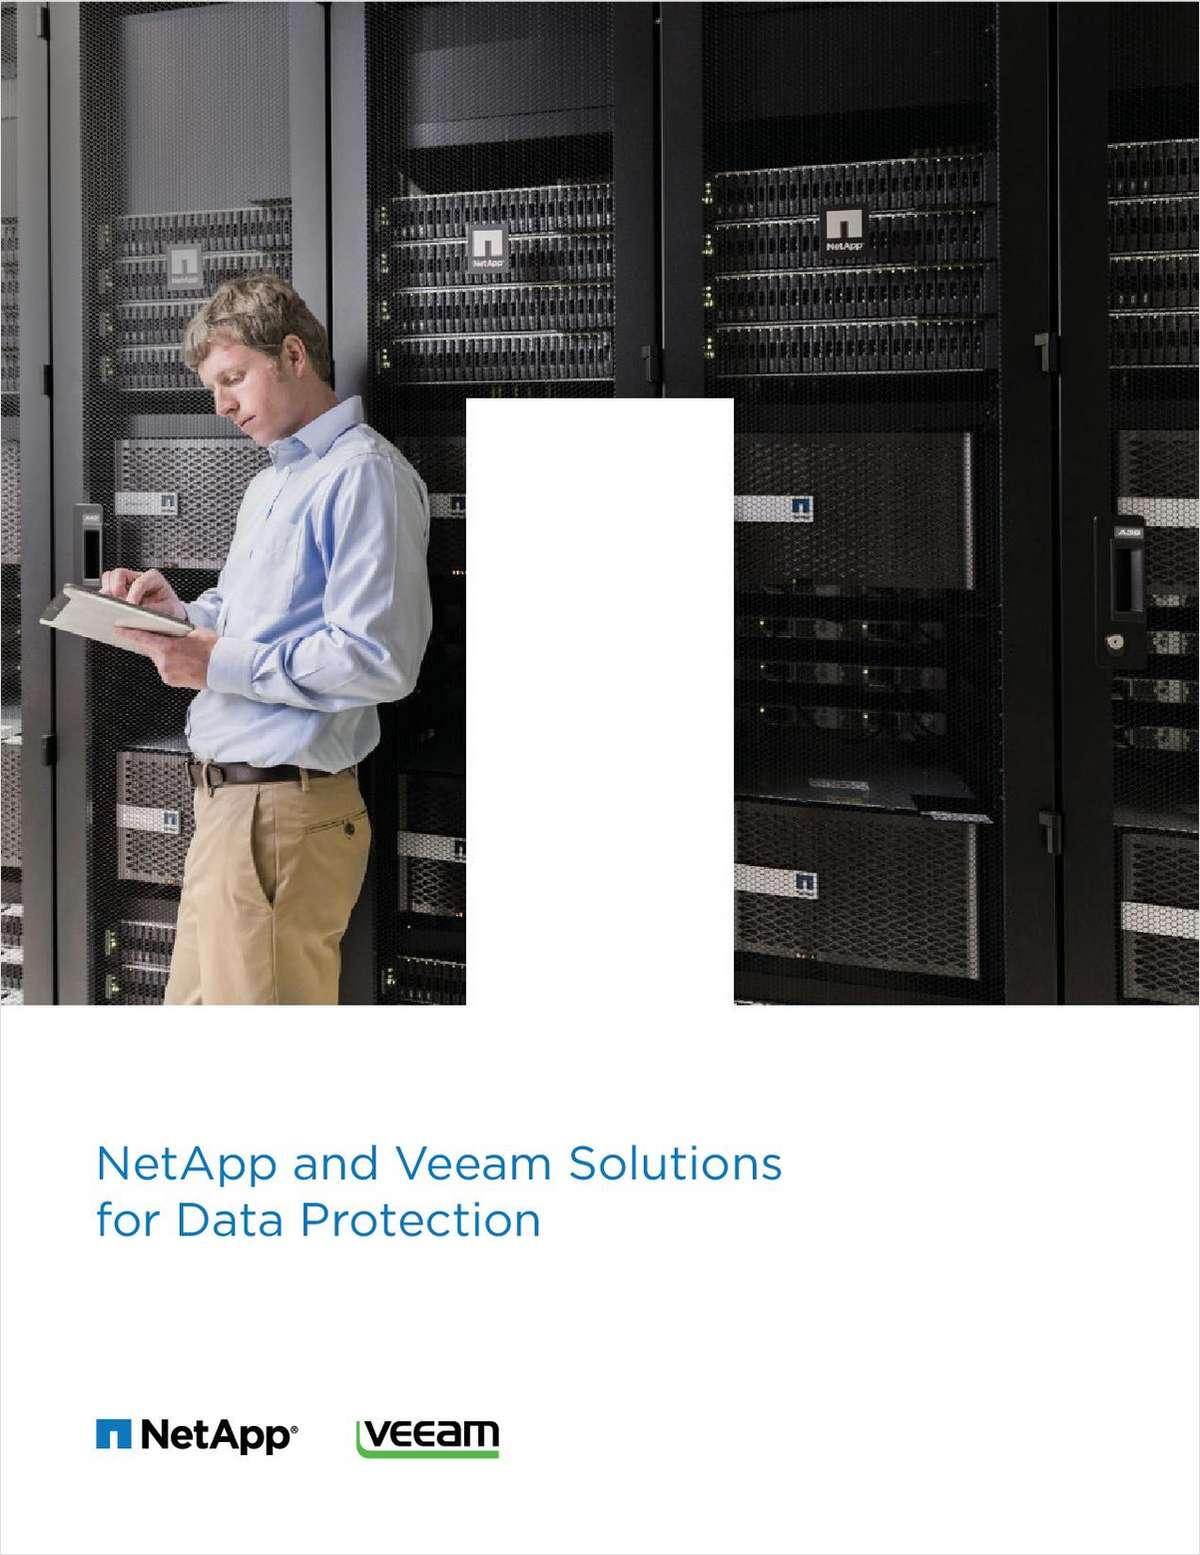 NetApp Use Cases Guide for Veeam Availability Solutions